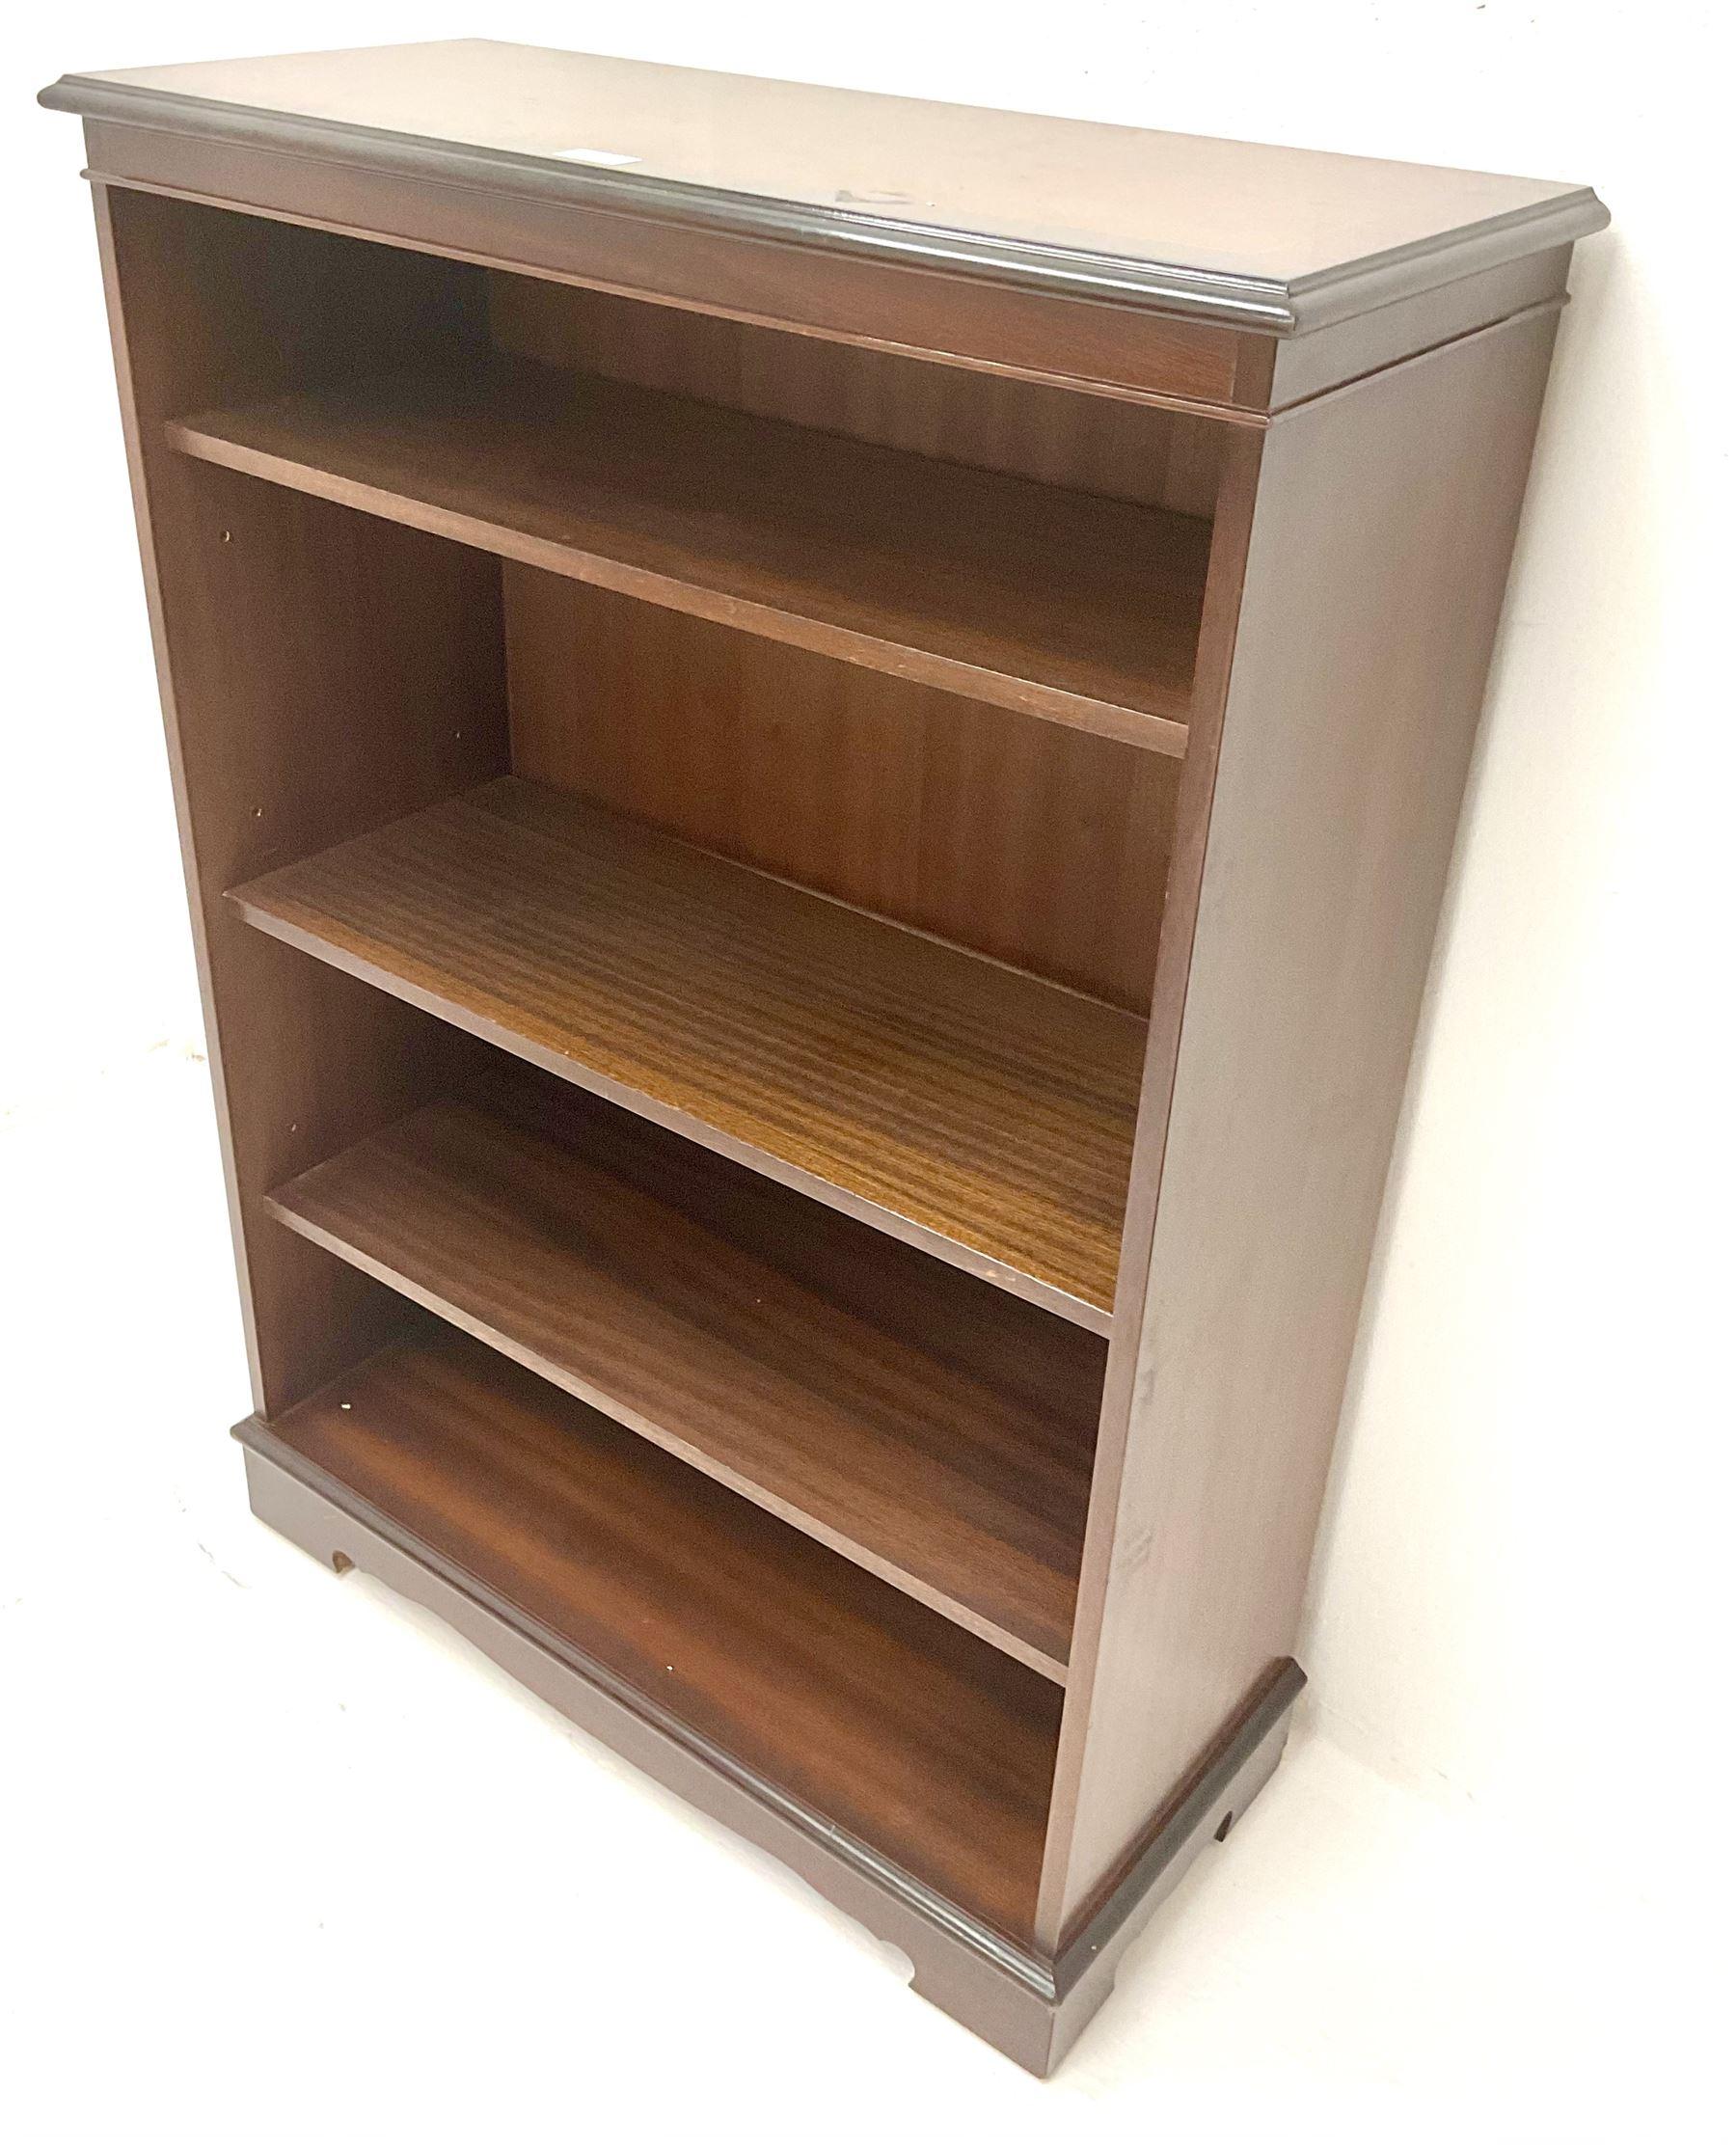 Small inlaid mahogany bookcase - Image 2 of 3